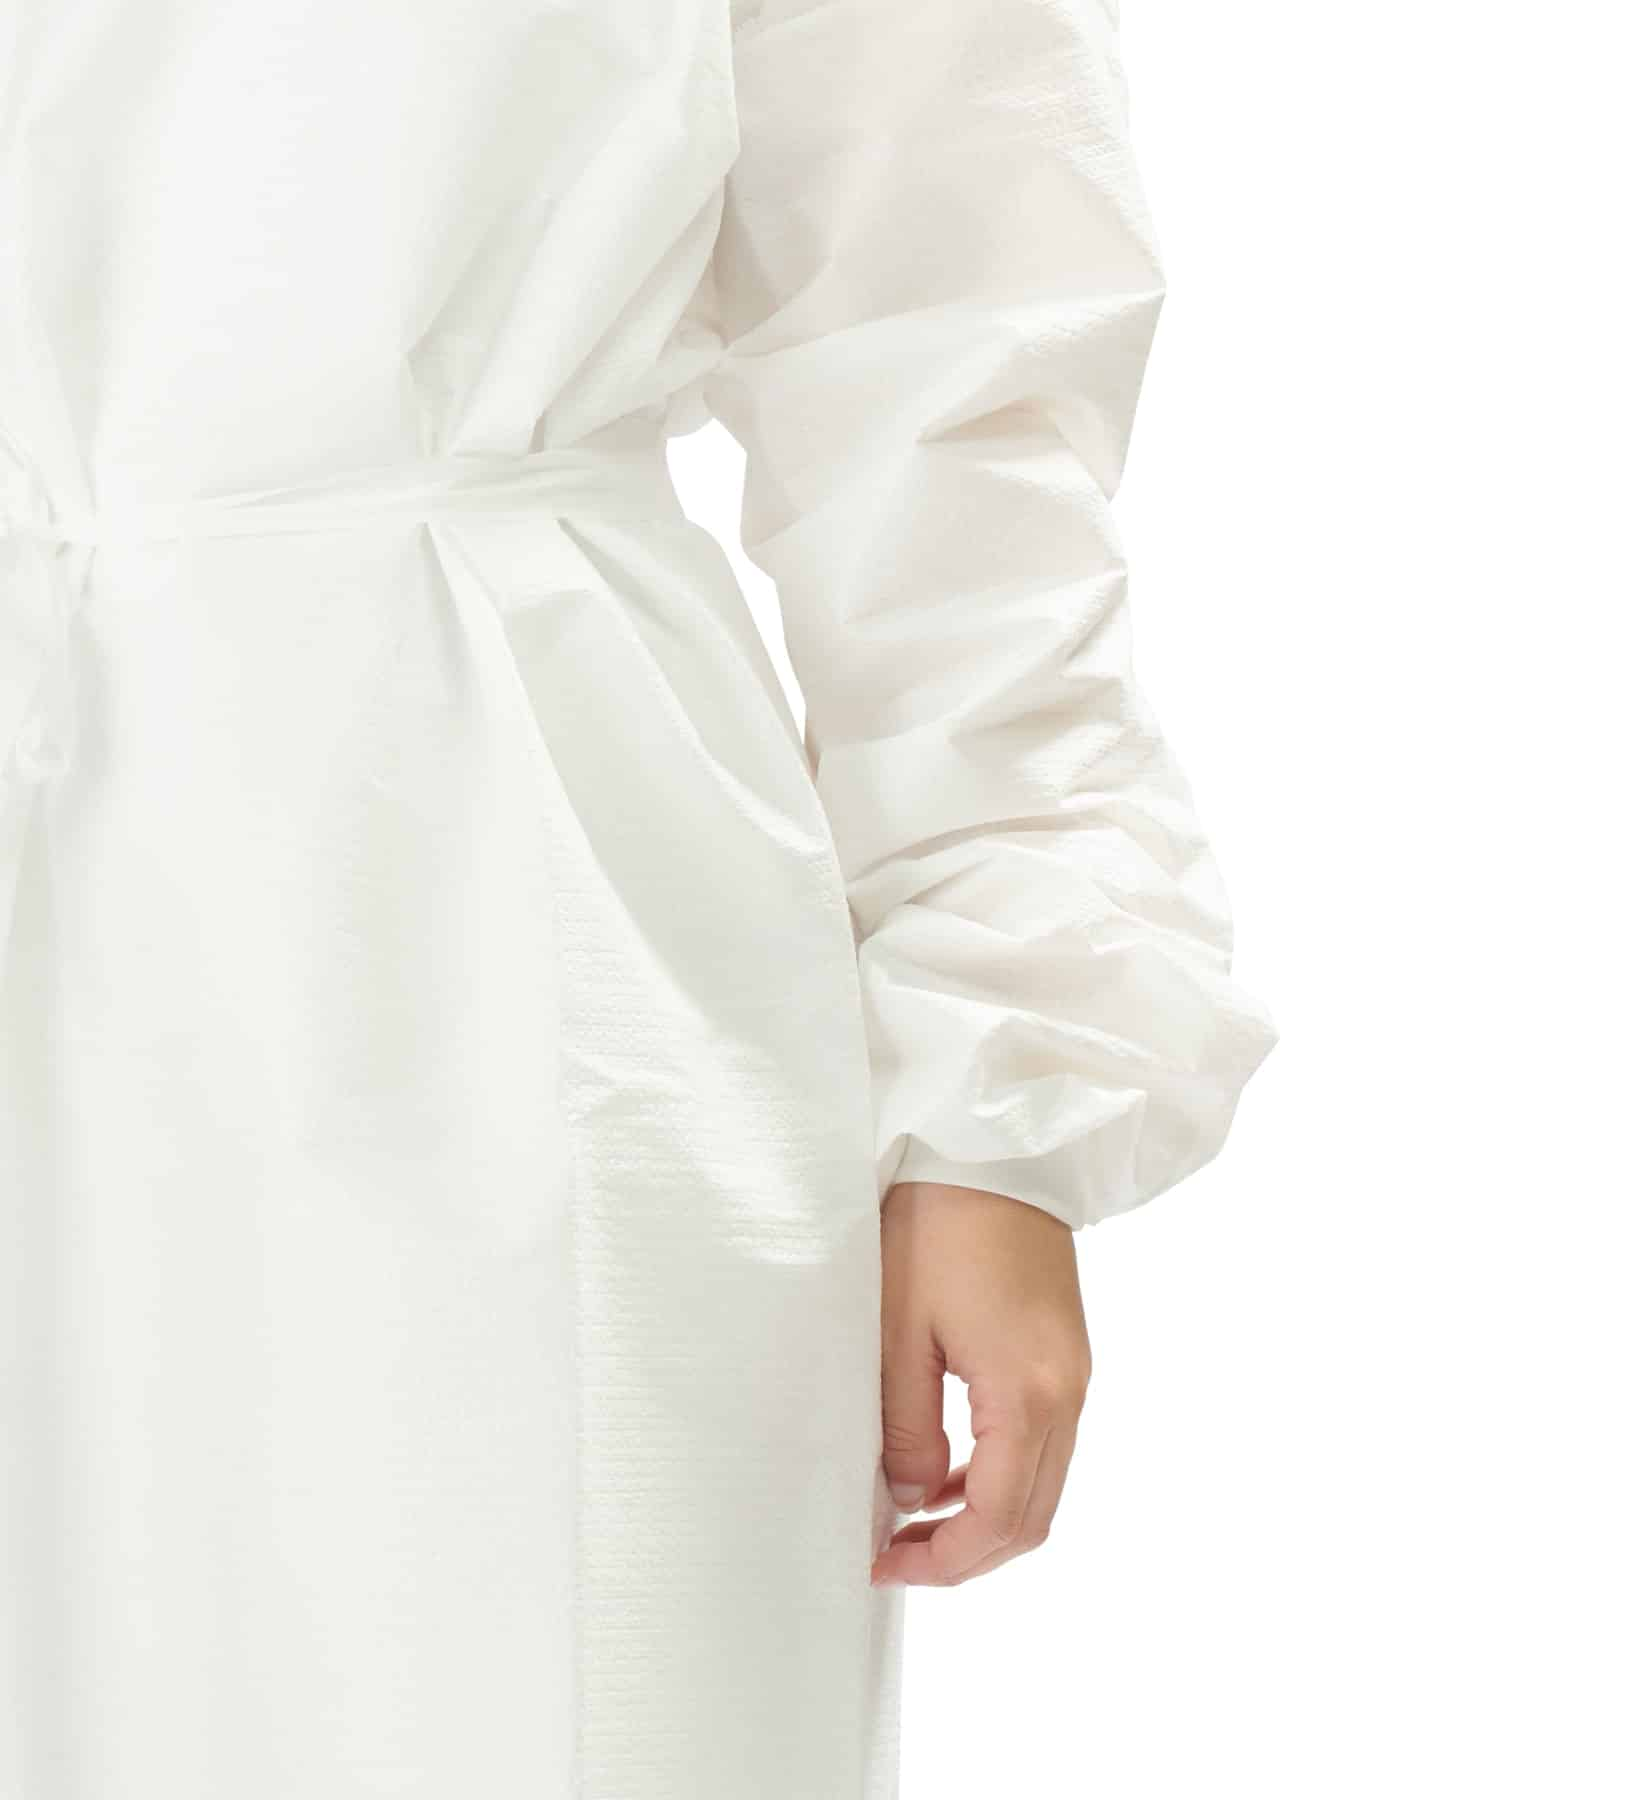 batas impermeáveis 8 - waterproof gowns - clothe protect